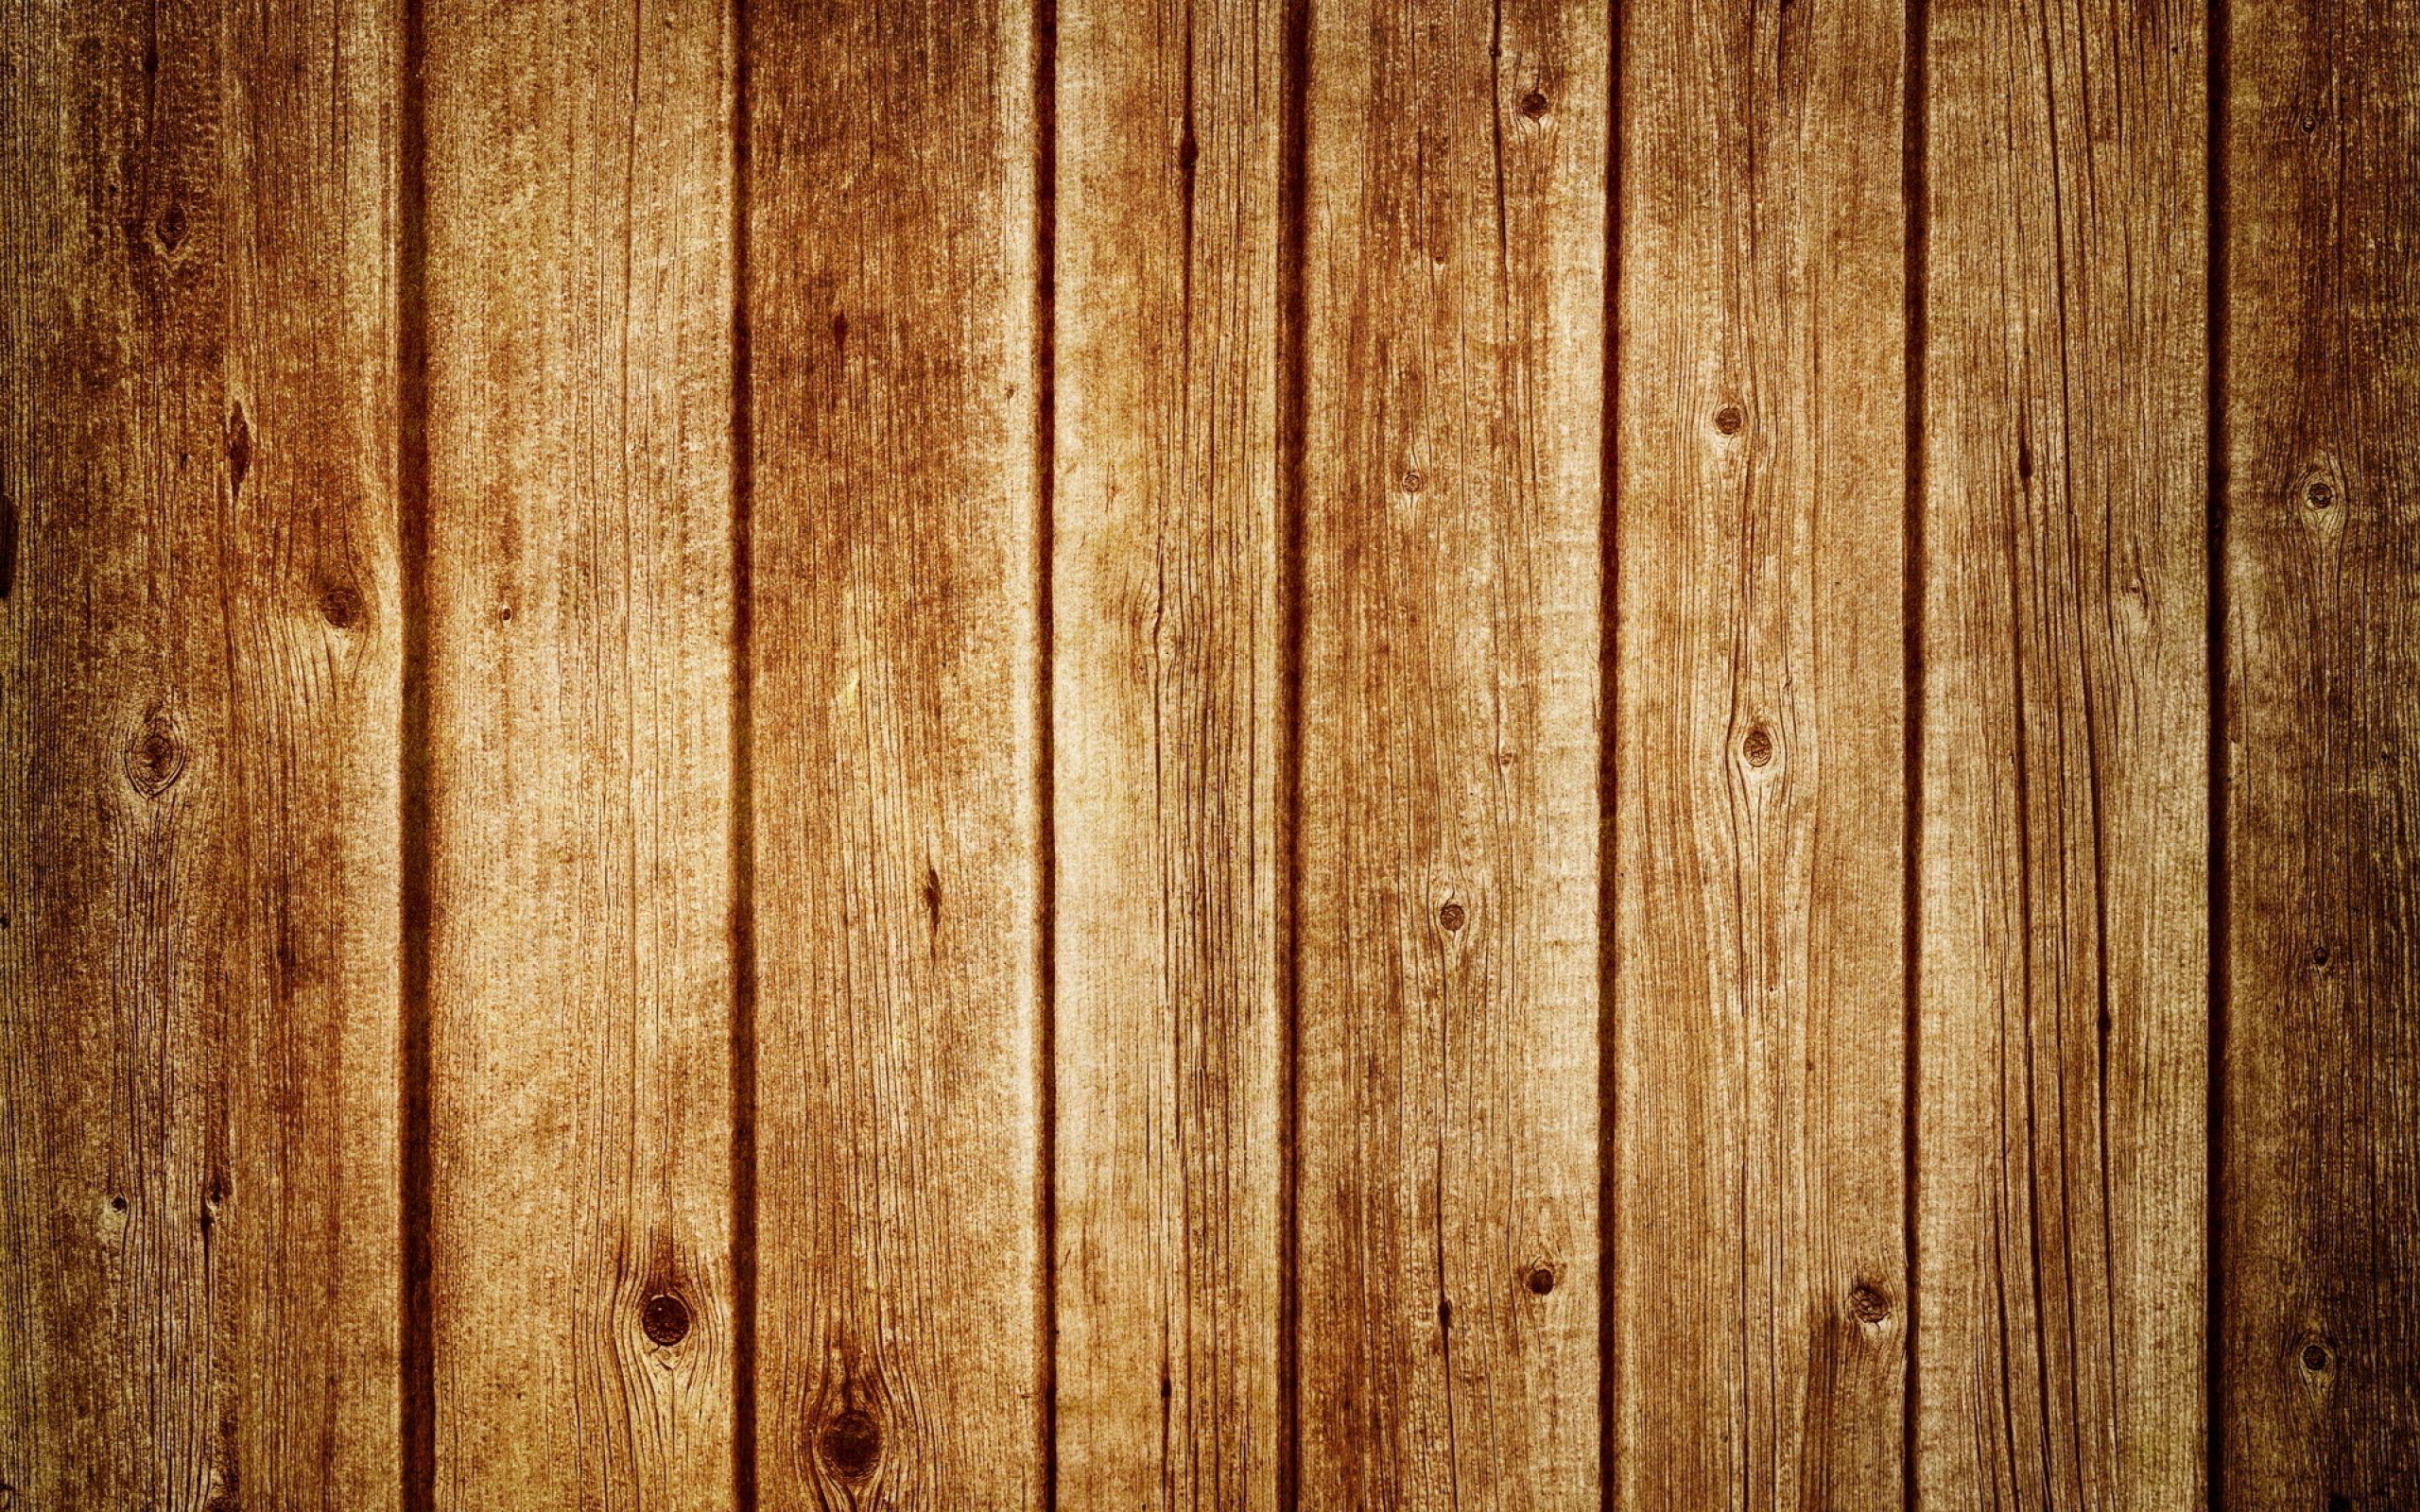 Whitewashed Wood Wallpaper Google Search Wood Wallpaper Barnwood Wall Barn Wood Projects